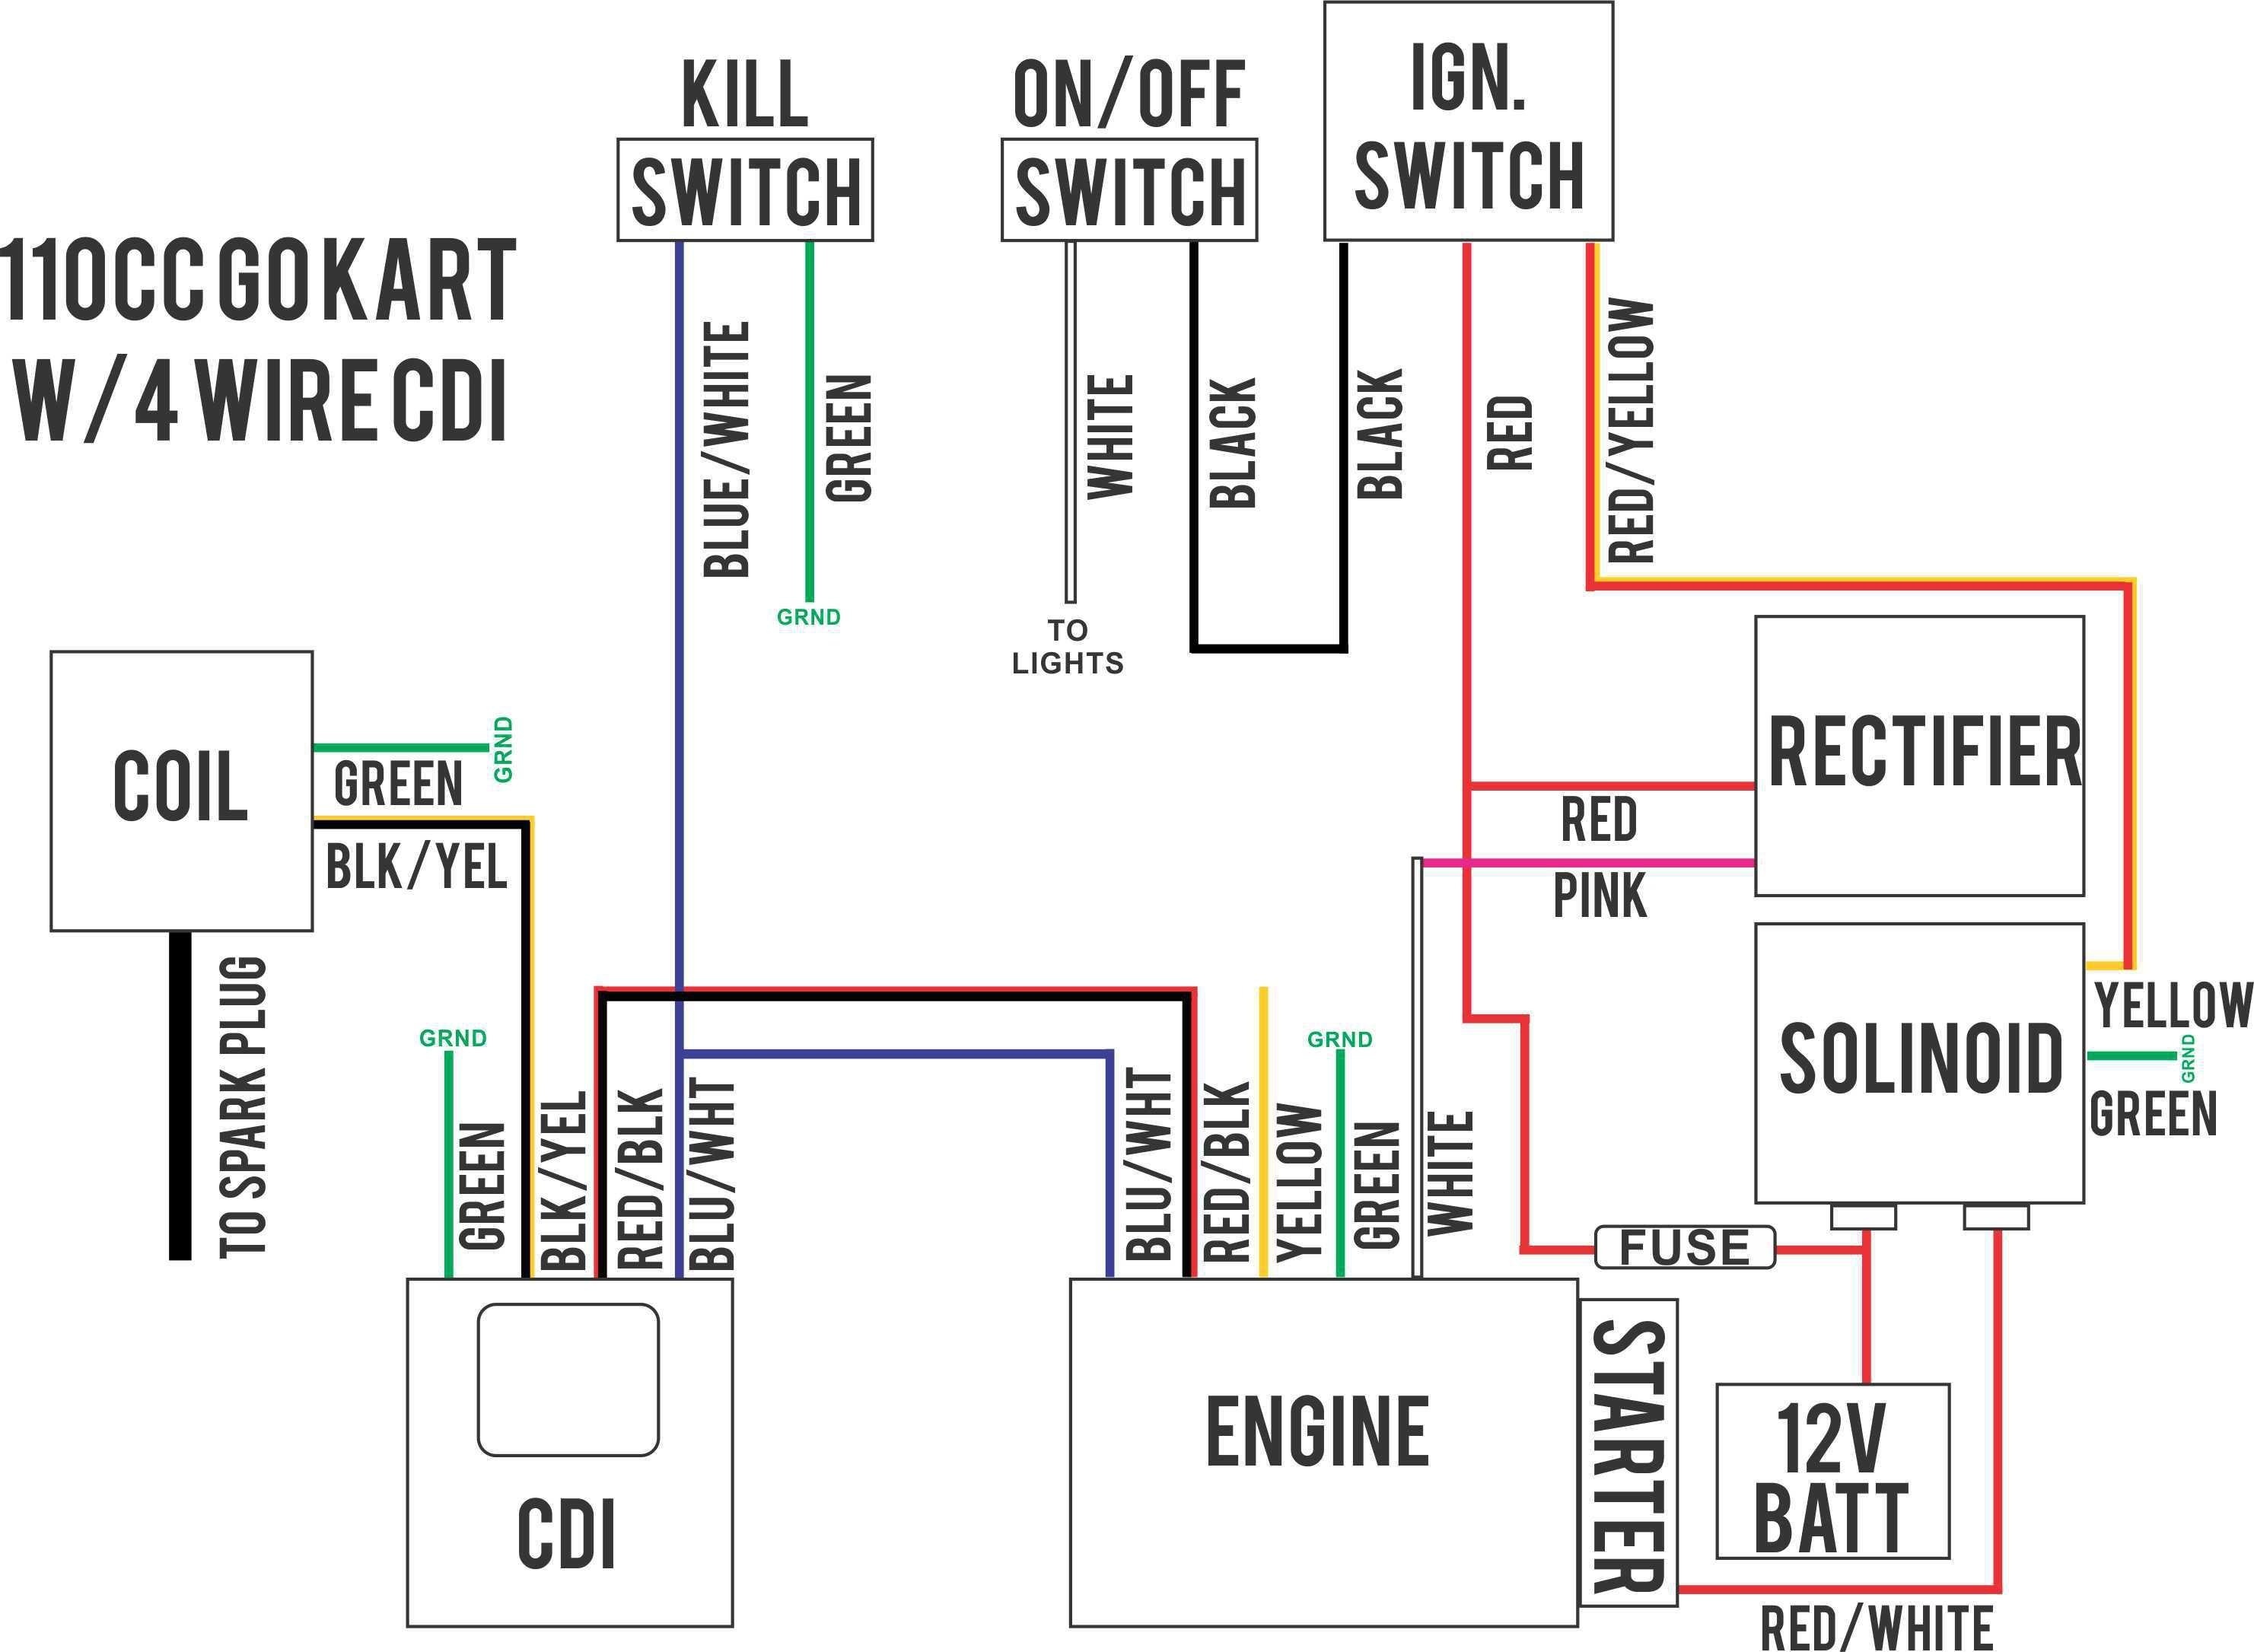 110v Plug Wiring Diagram Elegant Famous 6 Wire Cdi Wiring Diagram Electrical Circuit